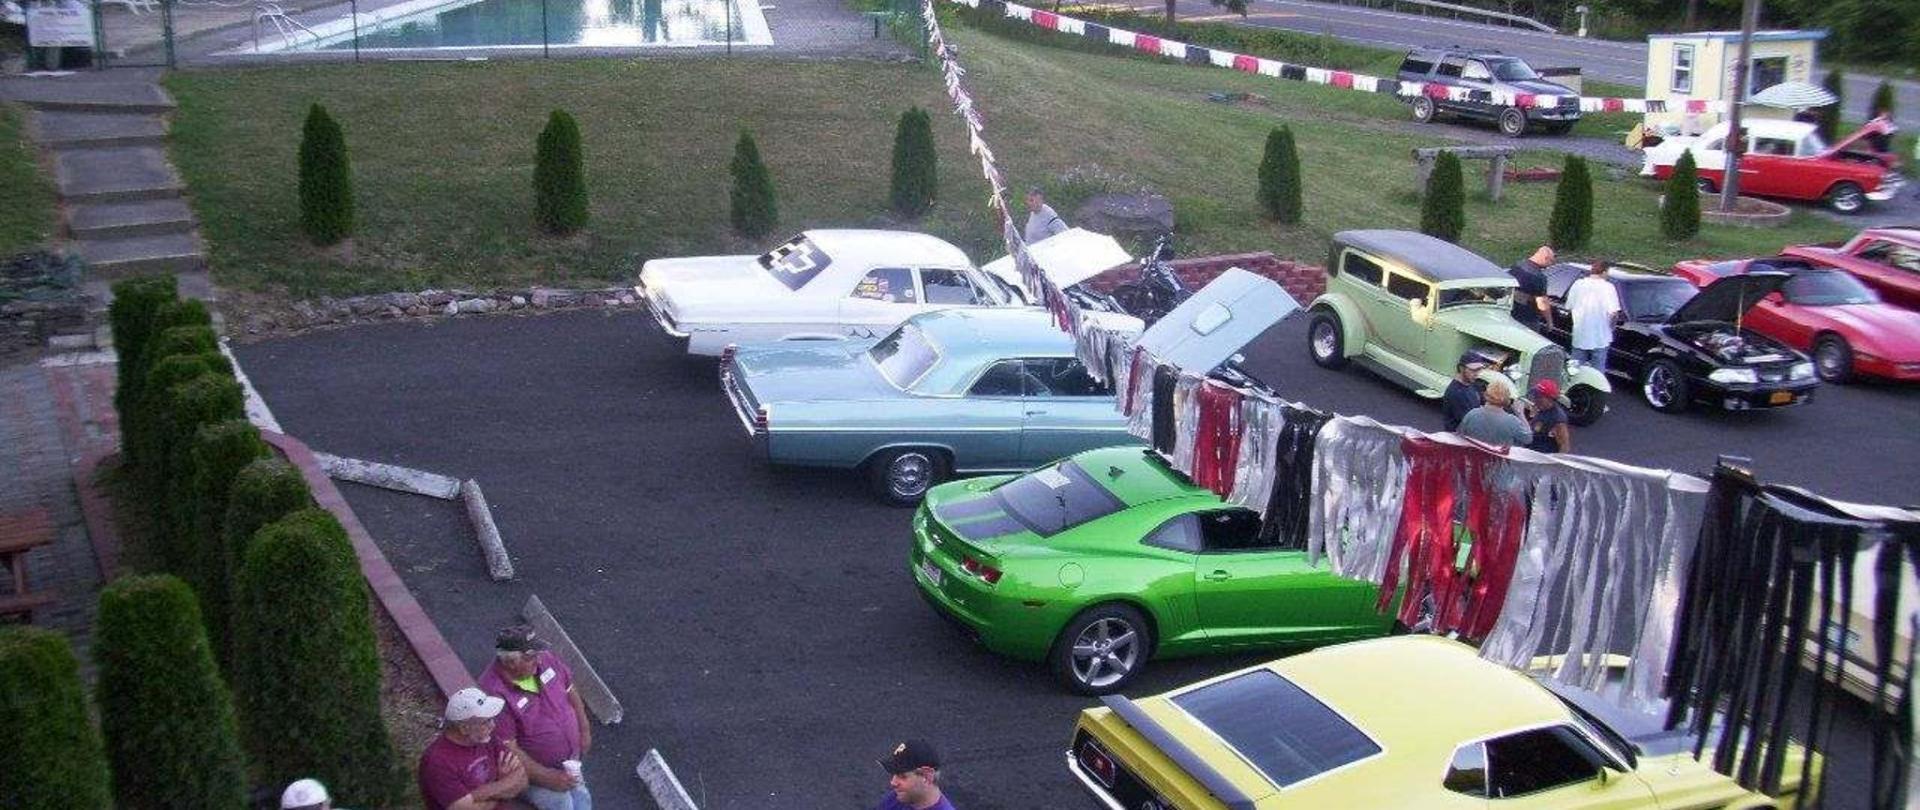 car-show-003.JPG